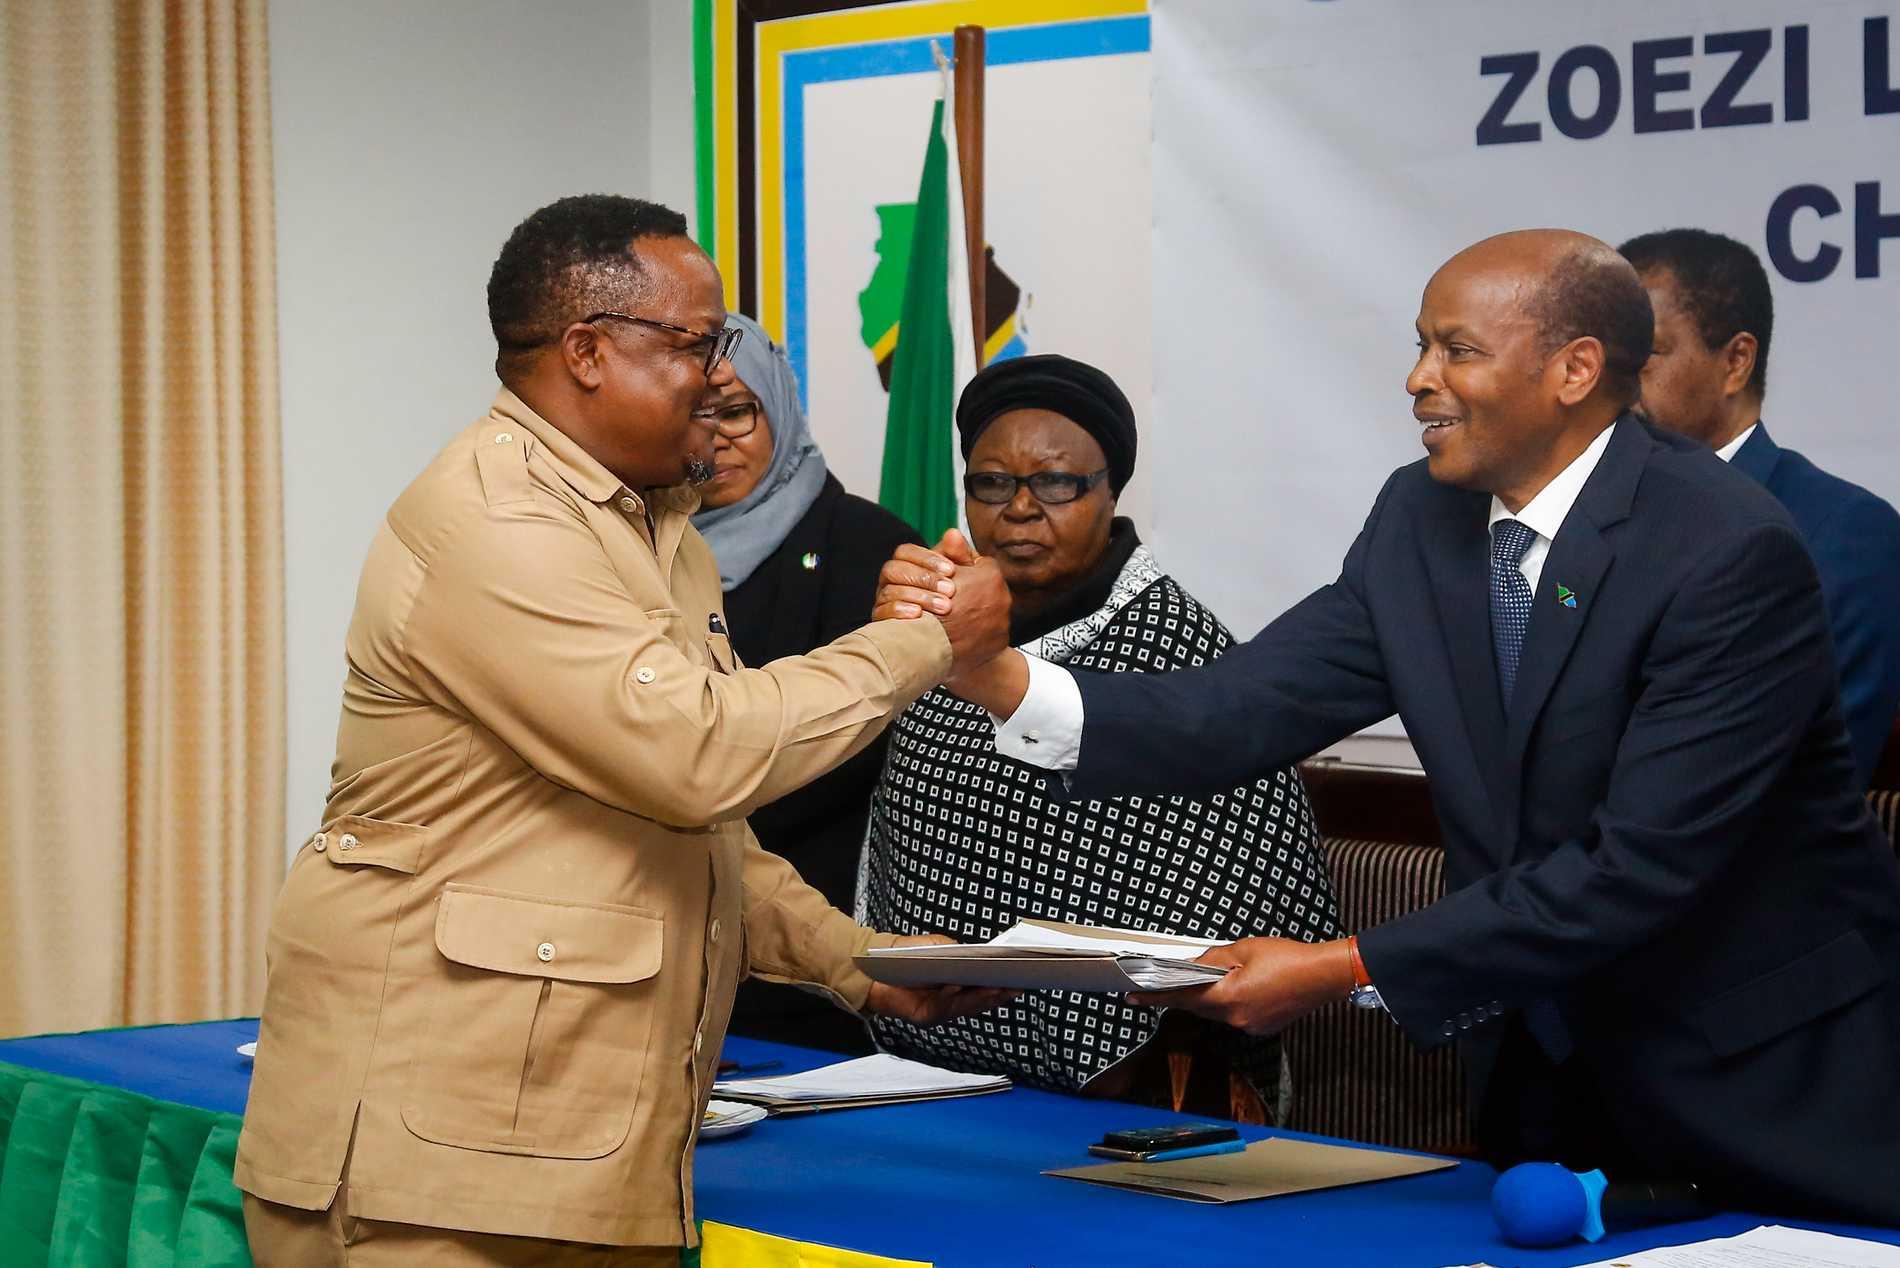 Chadima leader Tendo Lisu, pictured left, before the elections in Tanzania 2020.